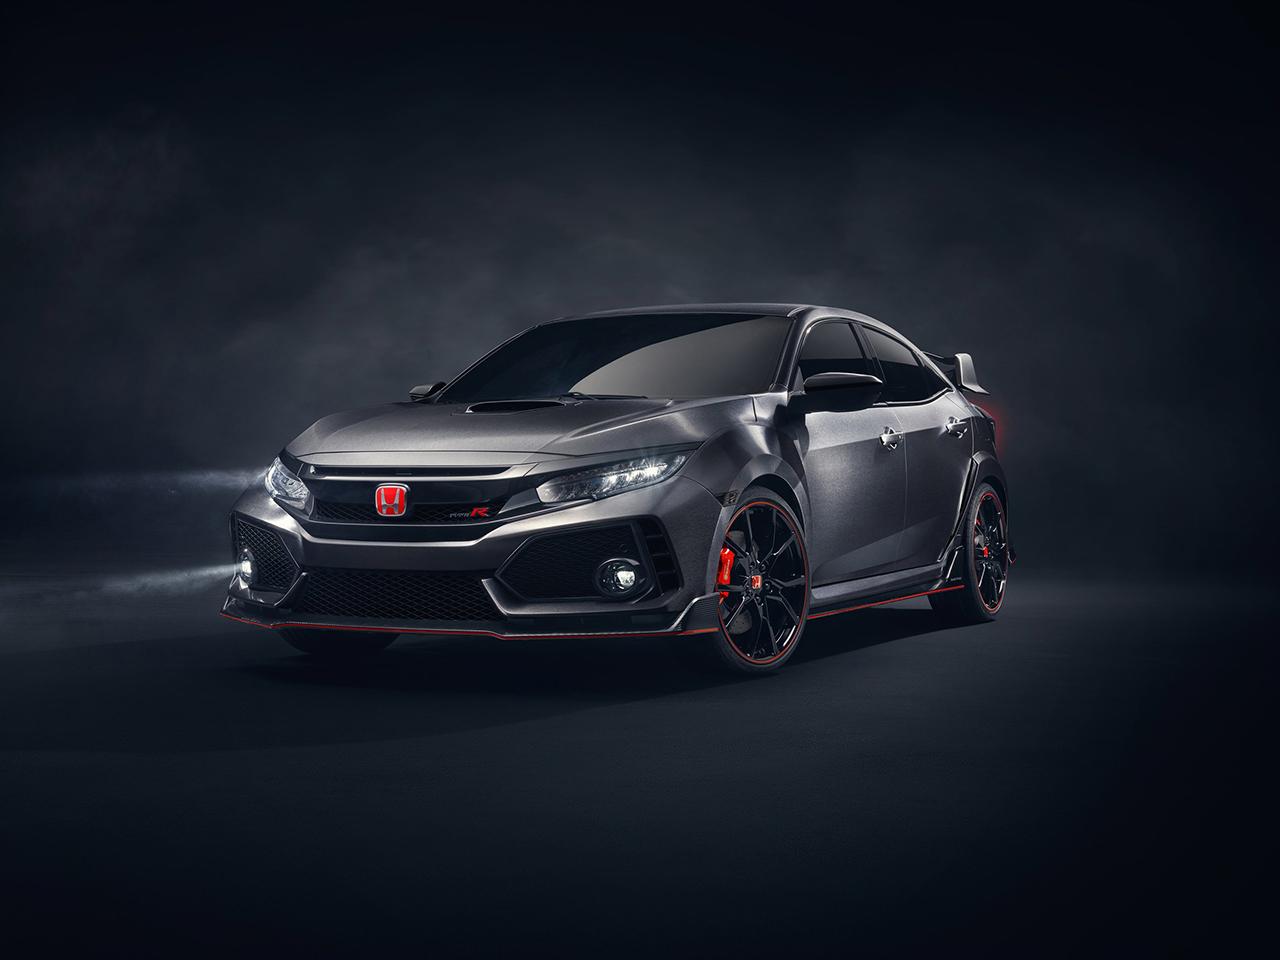 2017 Geneva Preview - 2018 Honda Civic Type R Prototype